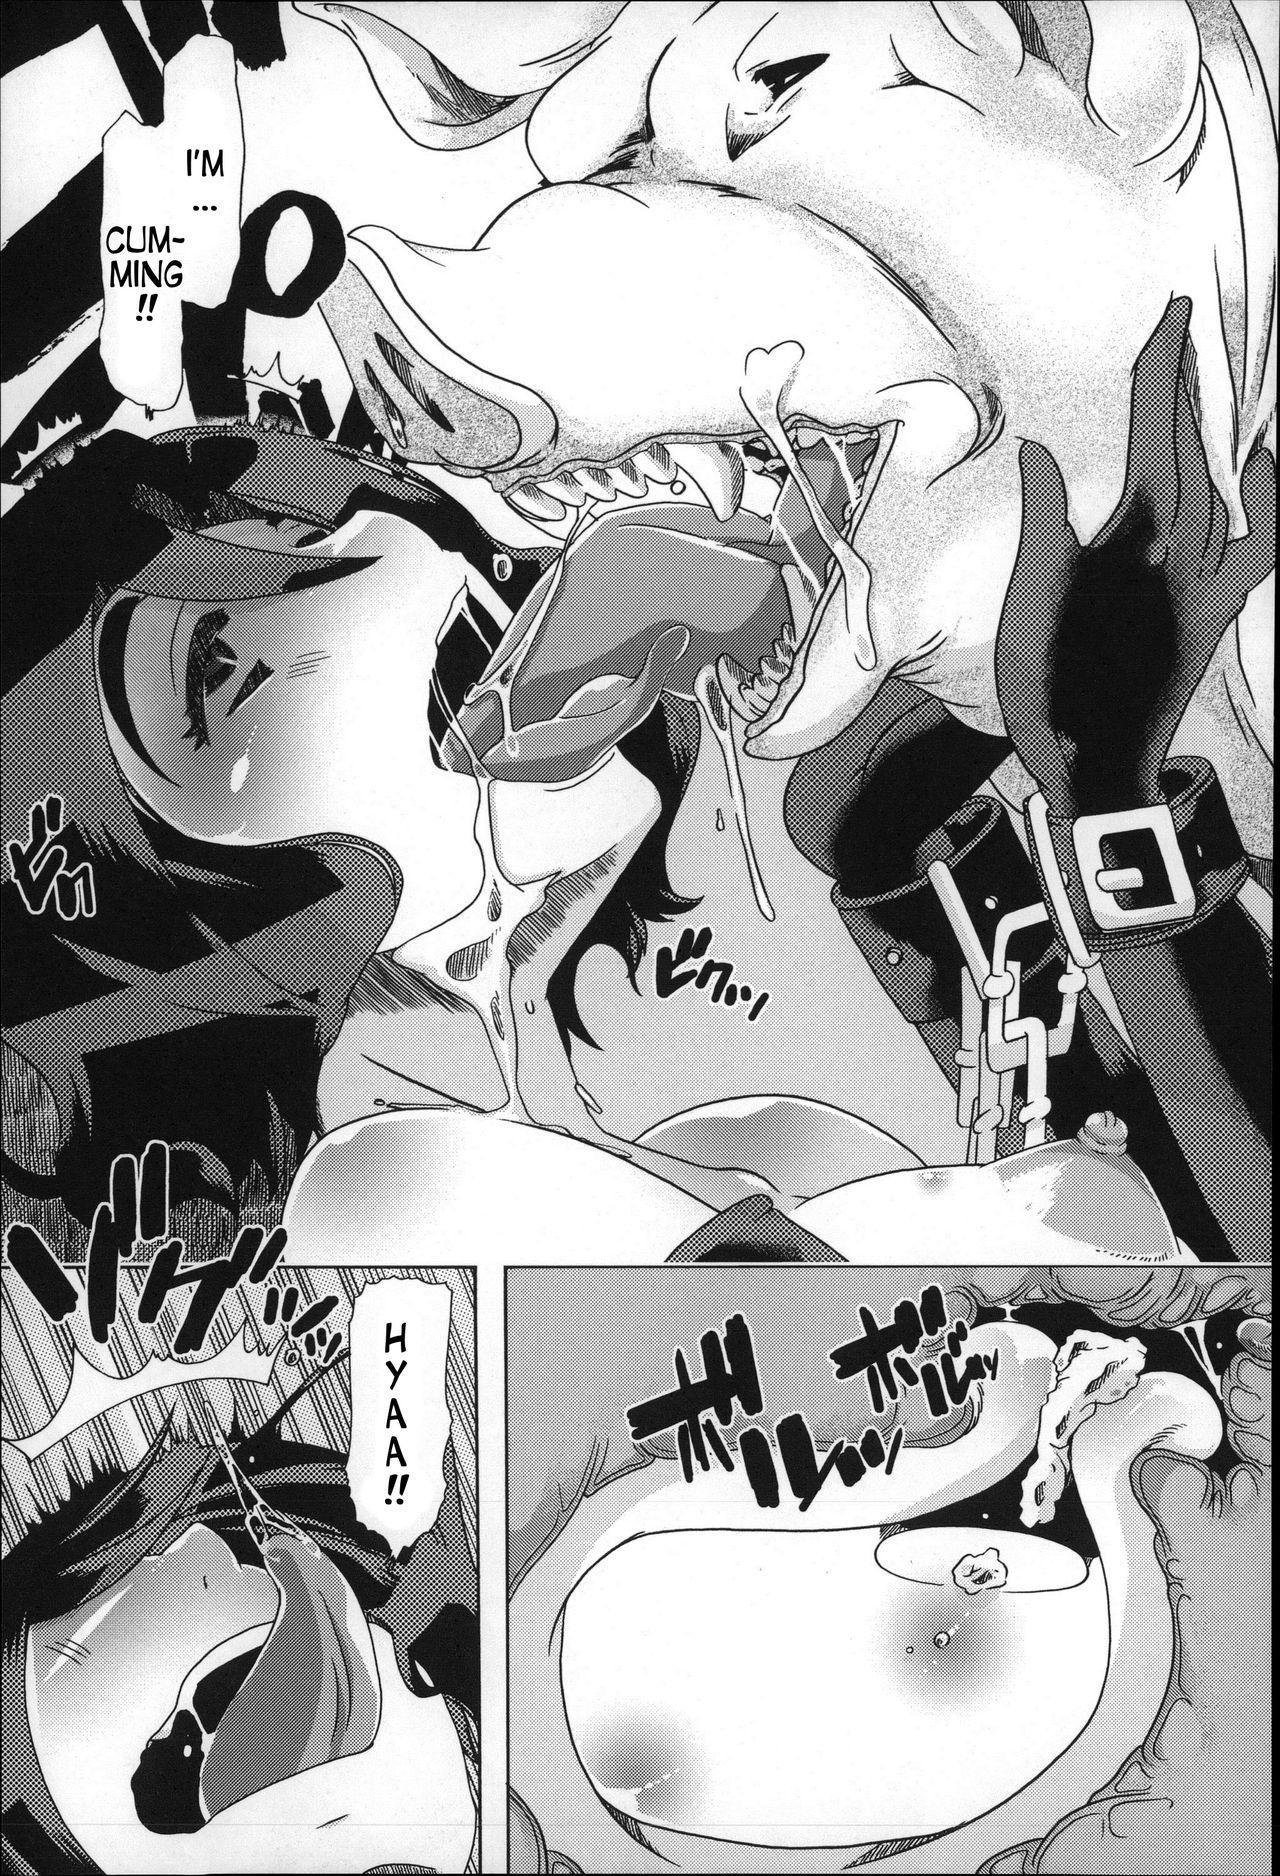 [Chikiko] Juukan - Tonkatsu   Bestiality - Pork Life (Cutlet) (Juukan Nikubenki Kasumi) [English] [Neeko7] 22